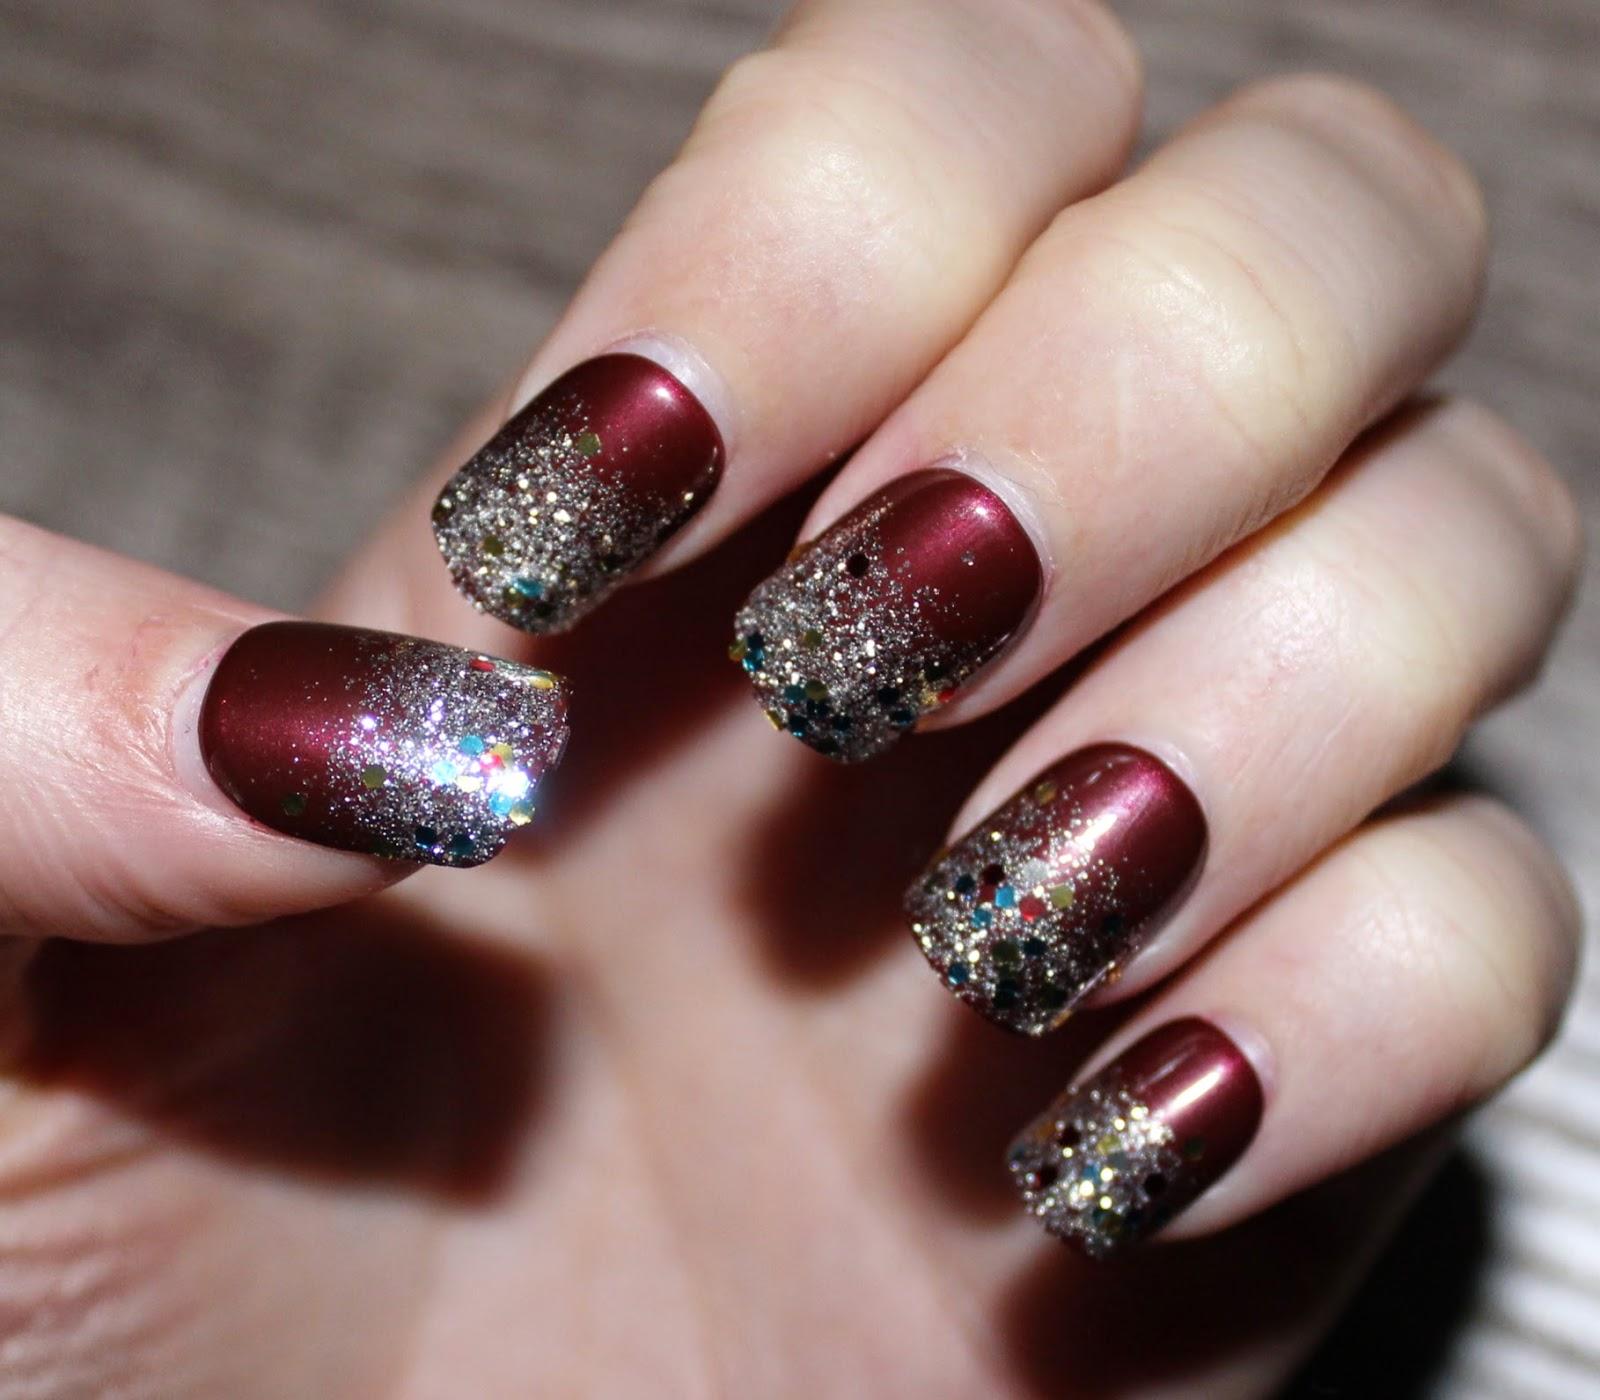 ImPress Press-On Manicure in Glitz & Glamour